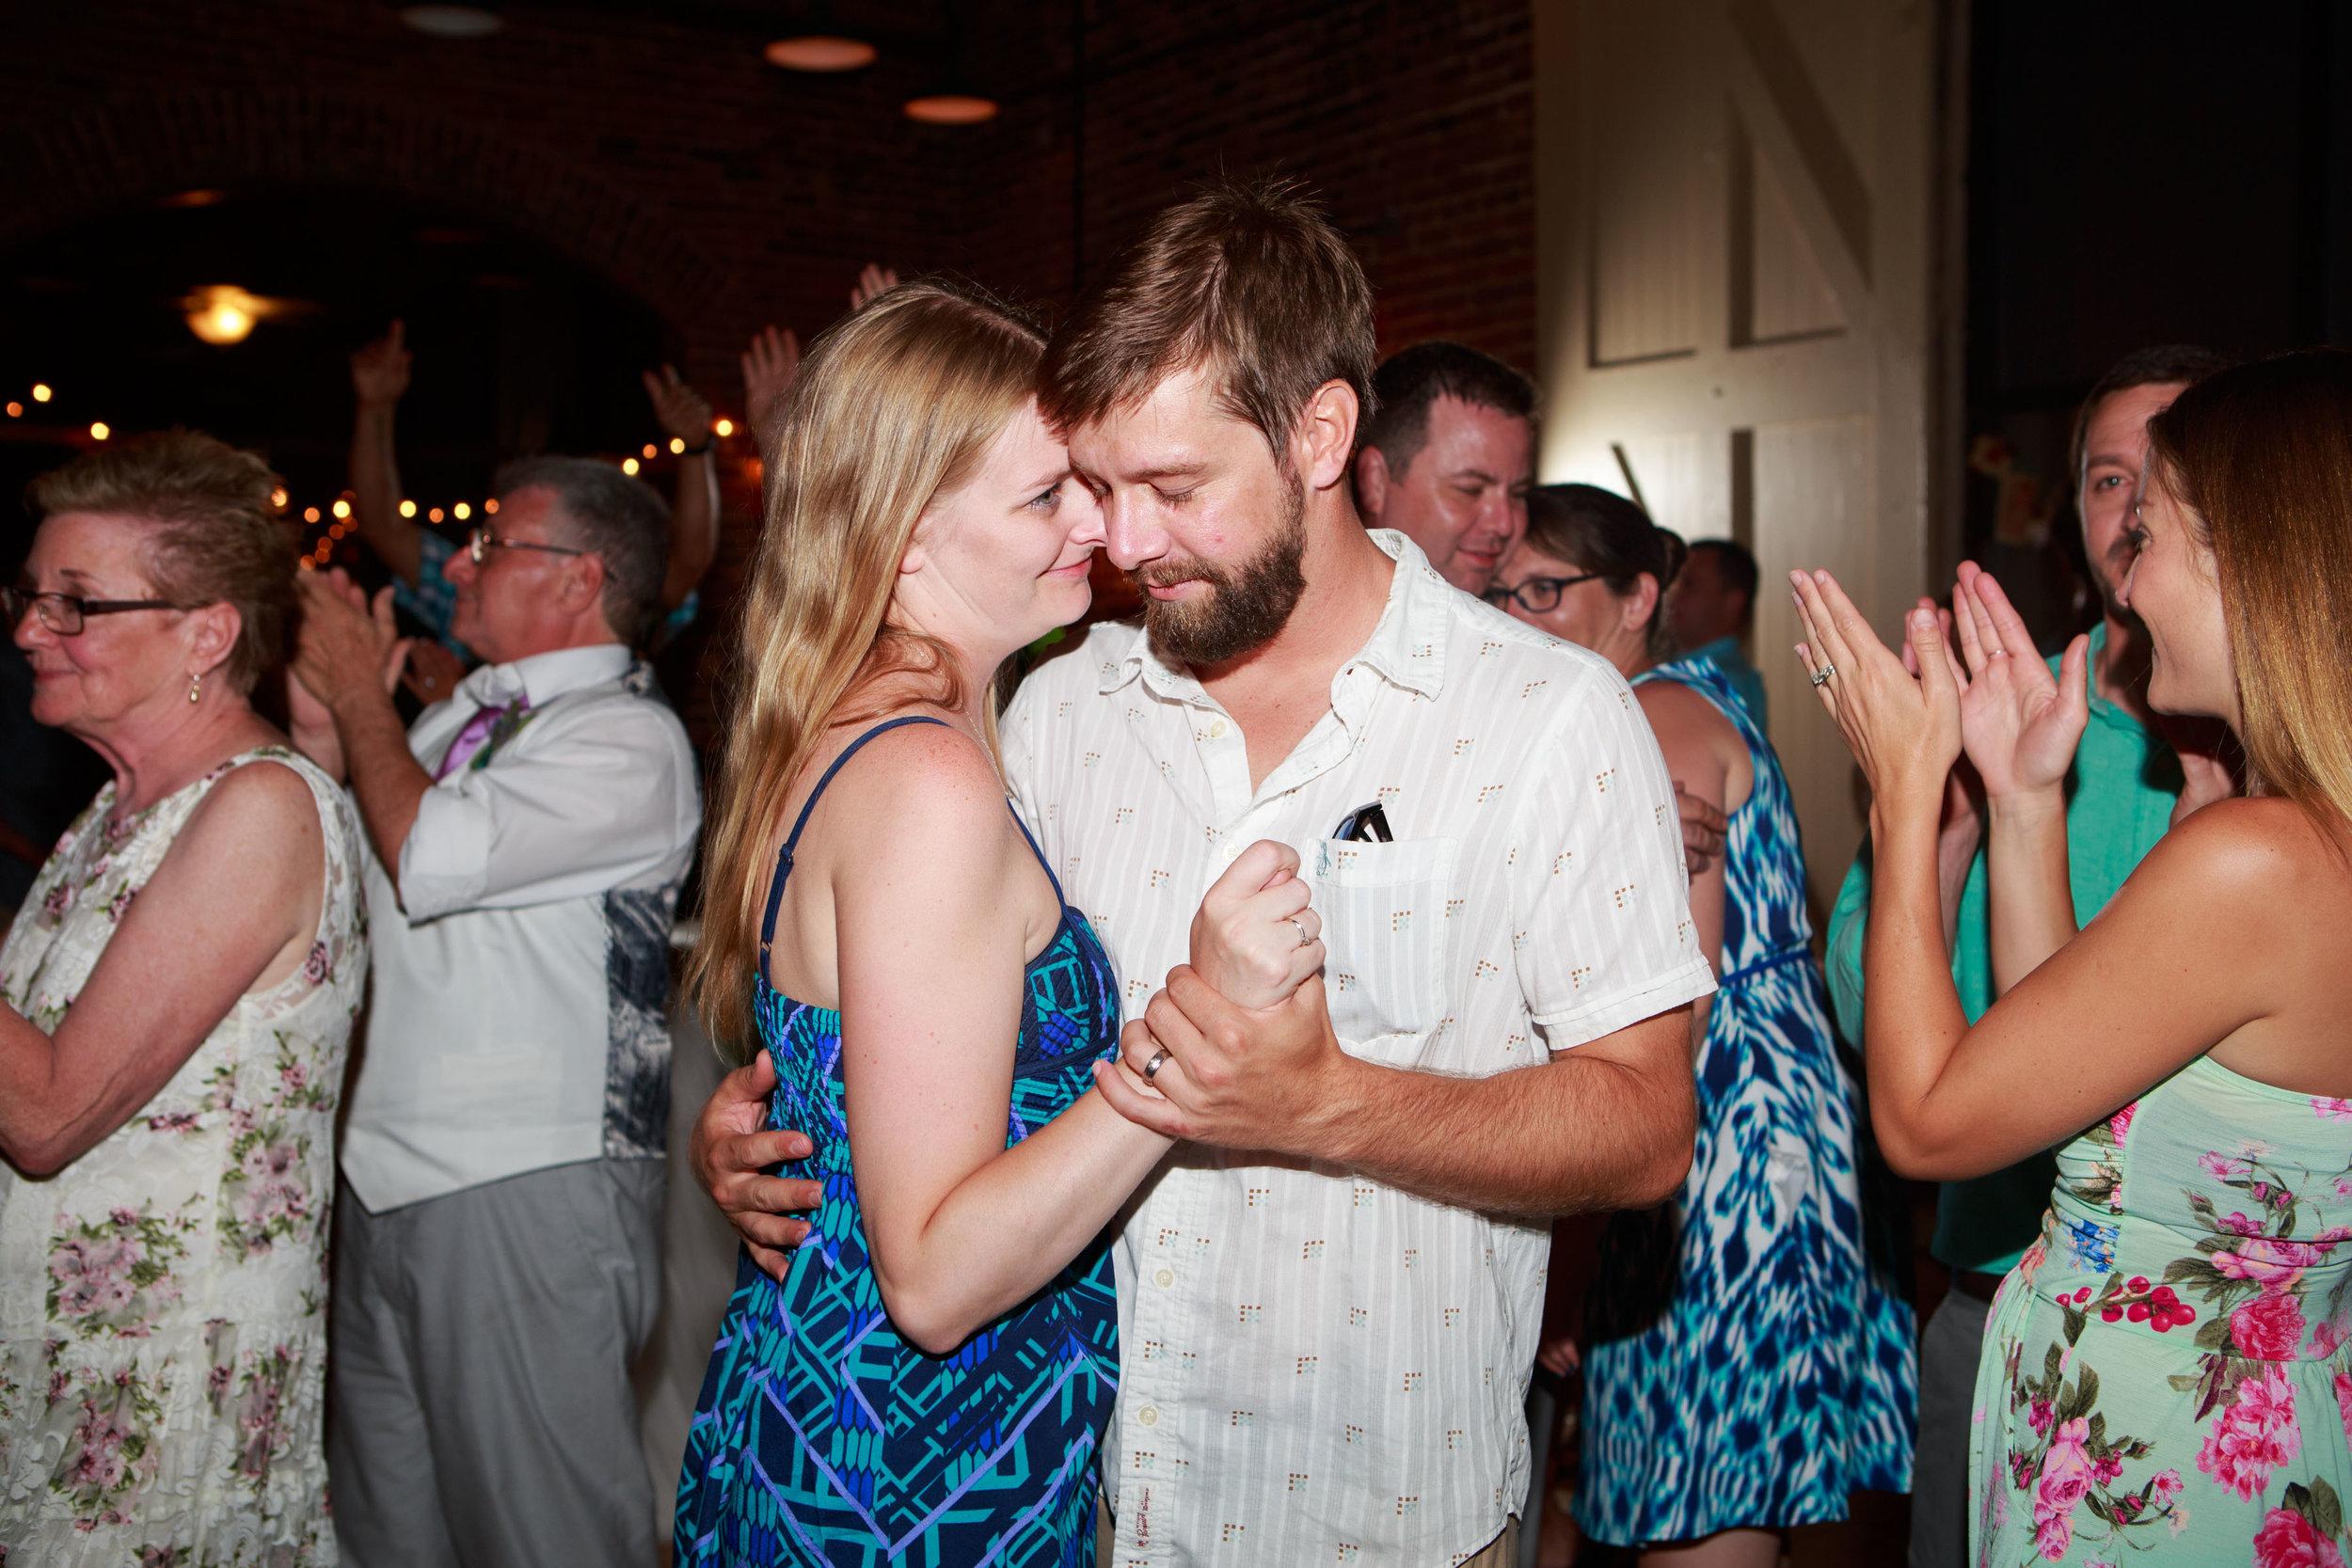 North_Carolina_Wedding_Photographer_Tiffany_Abruzzo_Reception_321.jpg